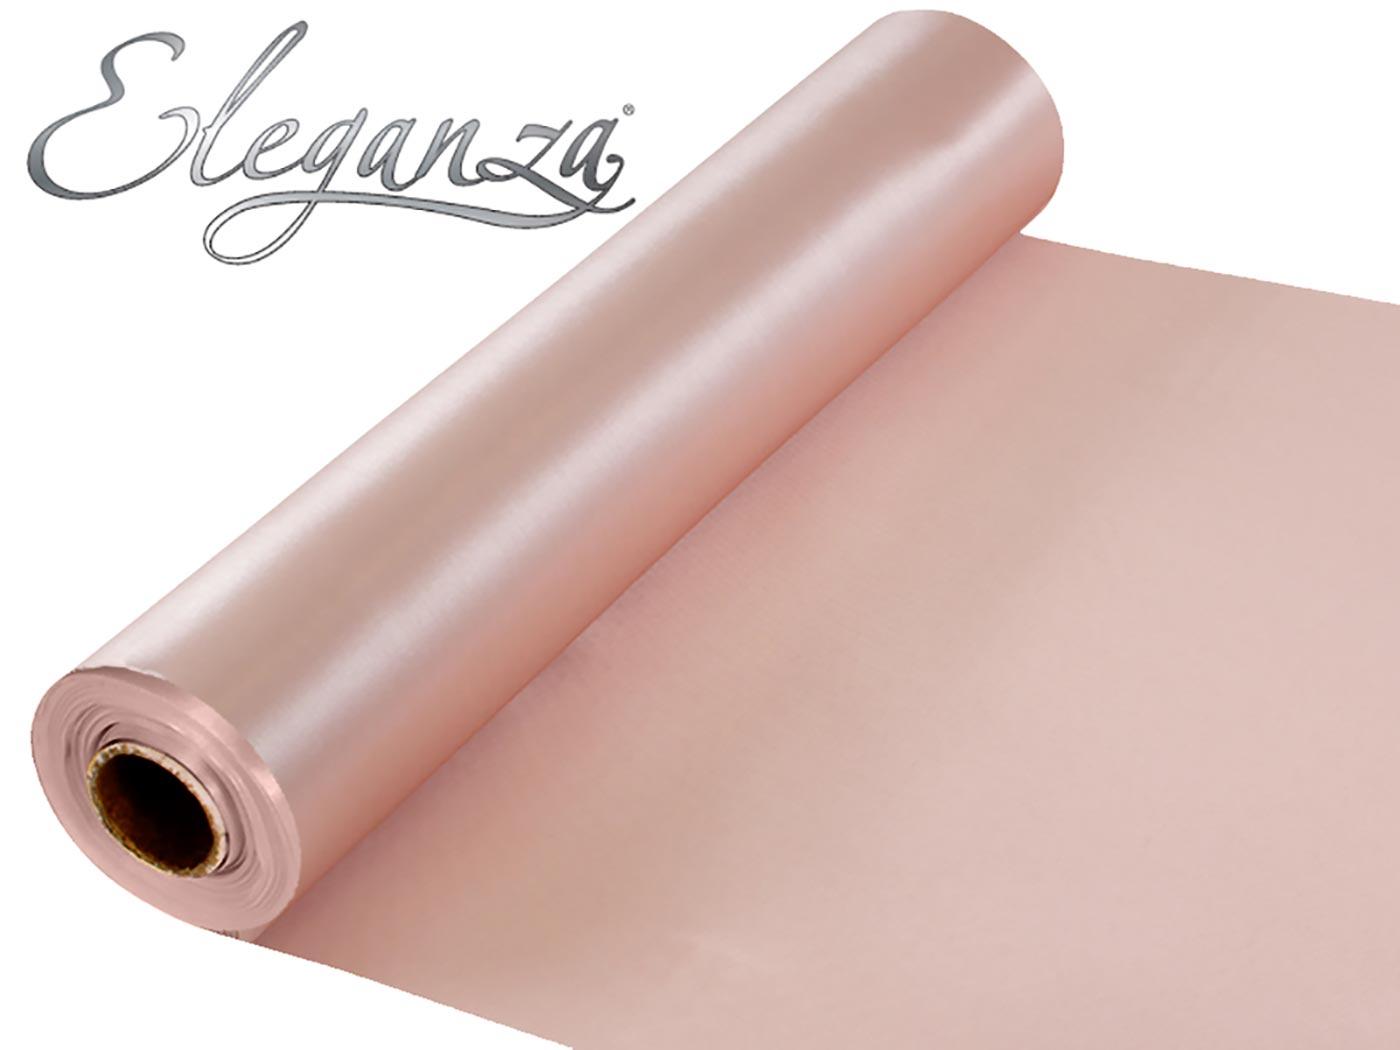 Eleganza Satin Fabric 29cm x 20m Rose Gold